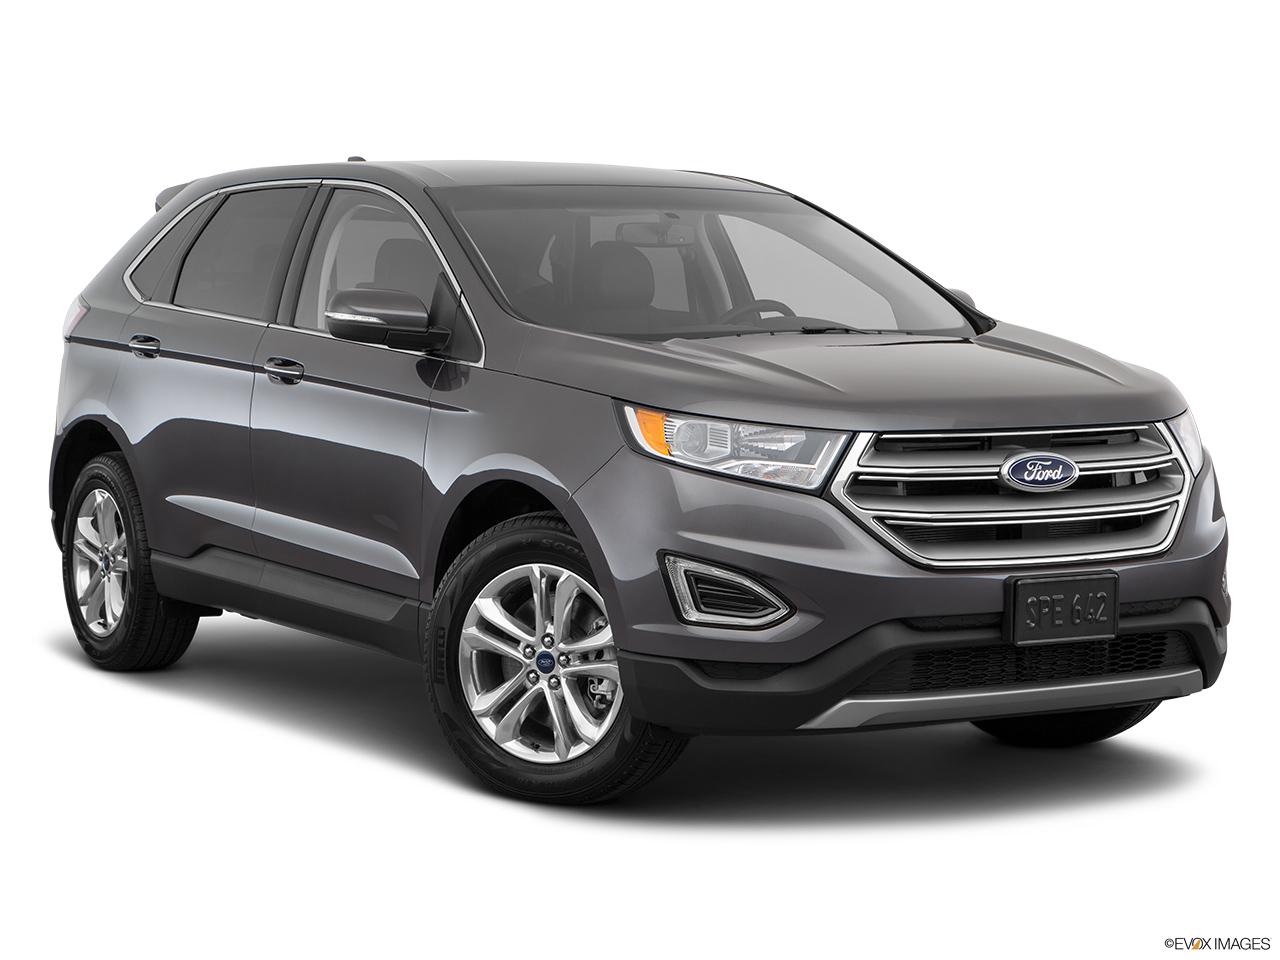 Ford Edge L V Titanium Awd Full Option Kuwait Front